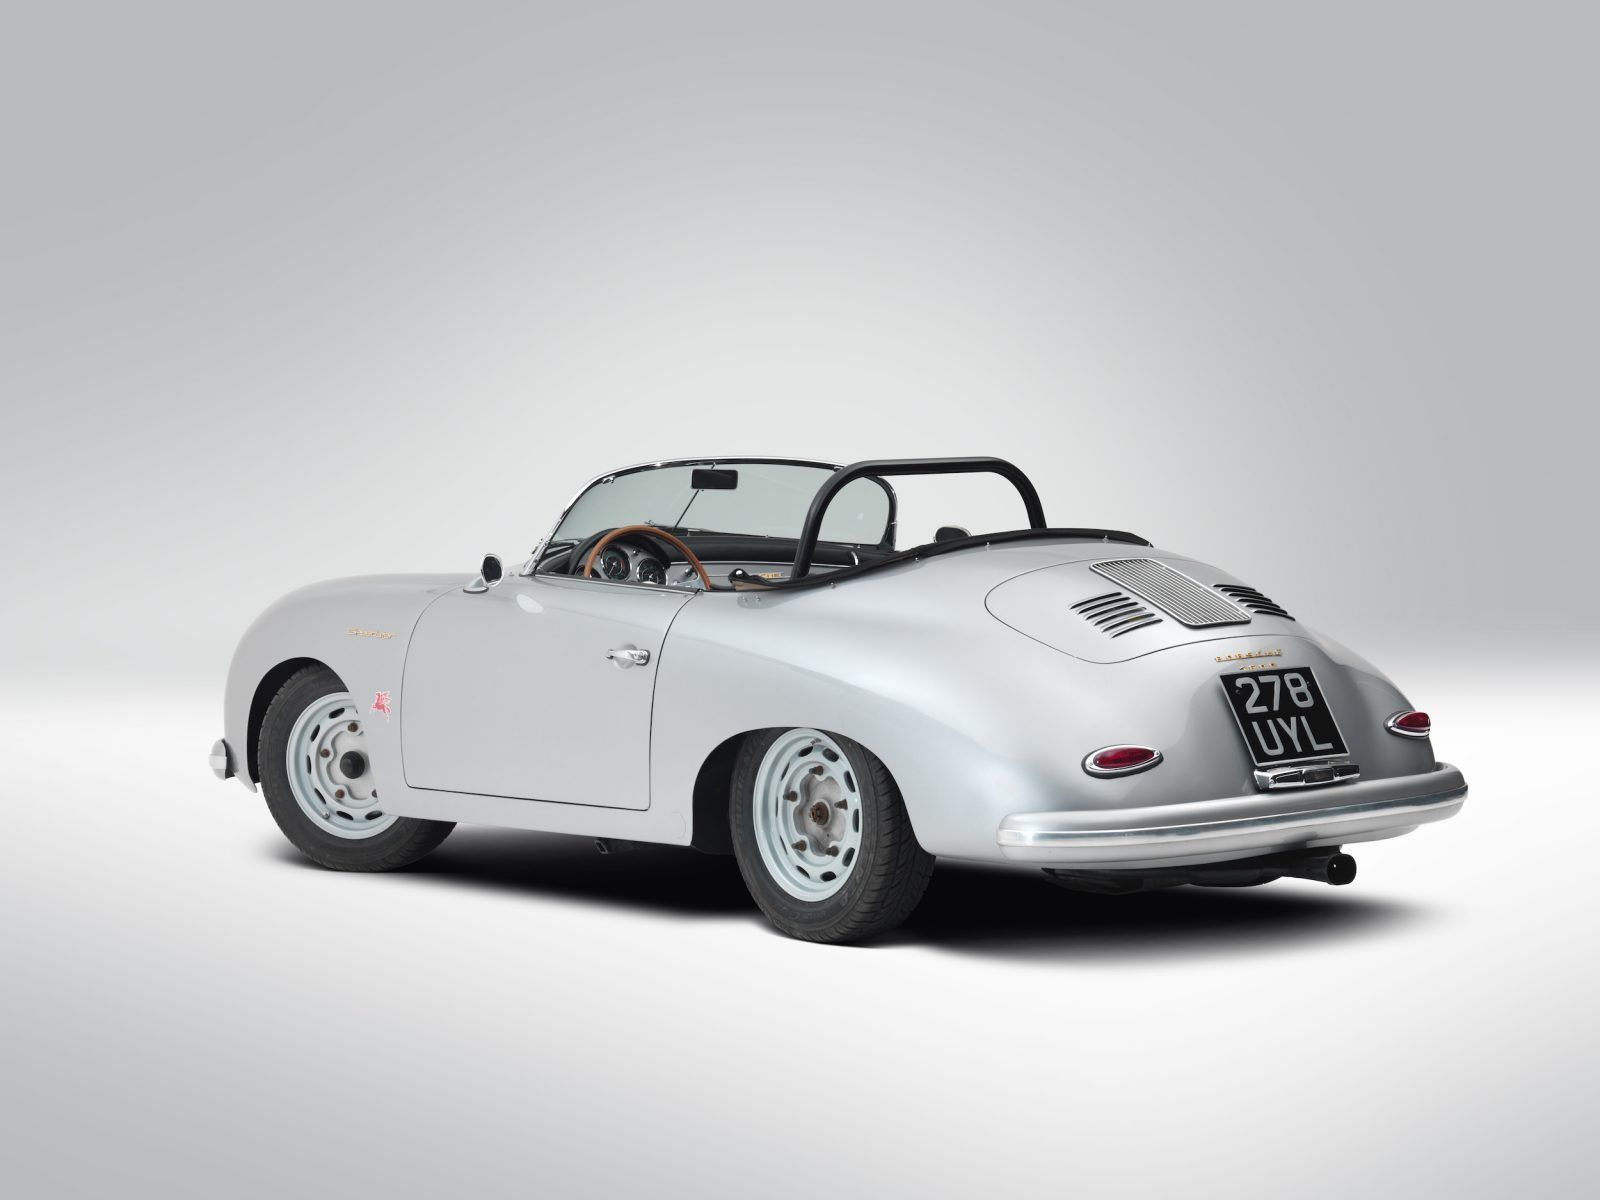 Porsche Usa Build >> A Short History Of The Porsche 356 Speedster The Porsche 356